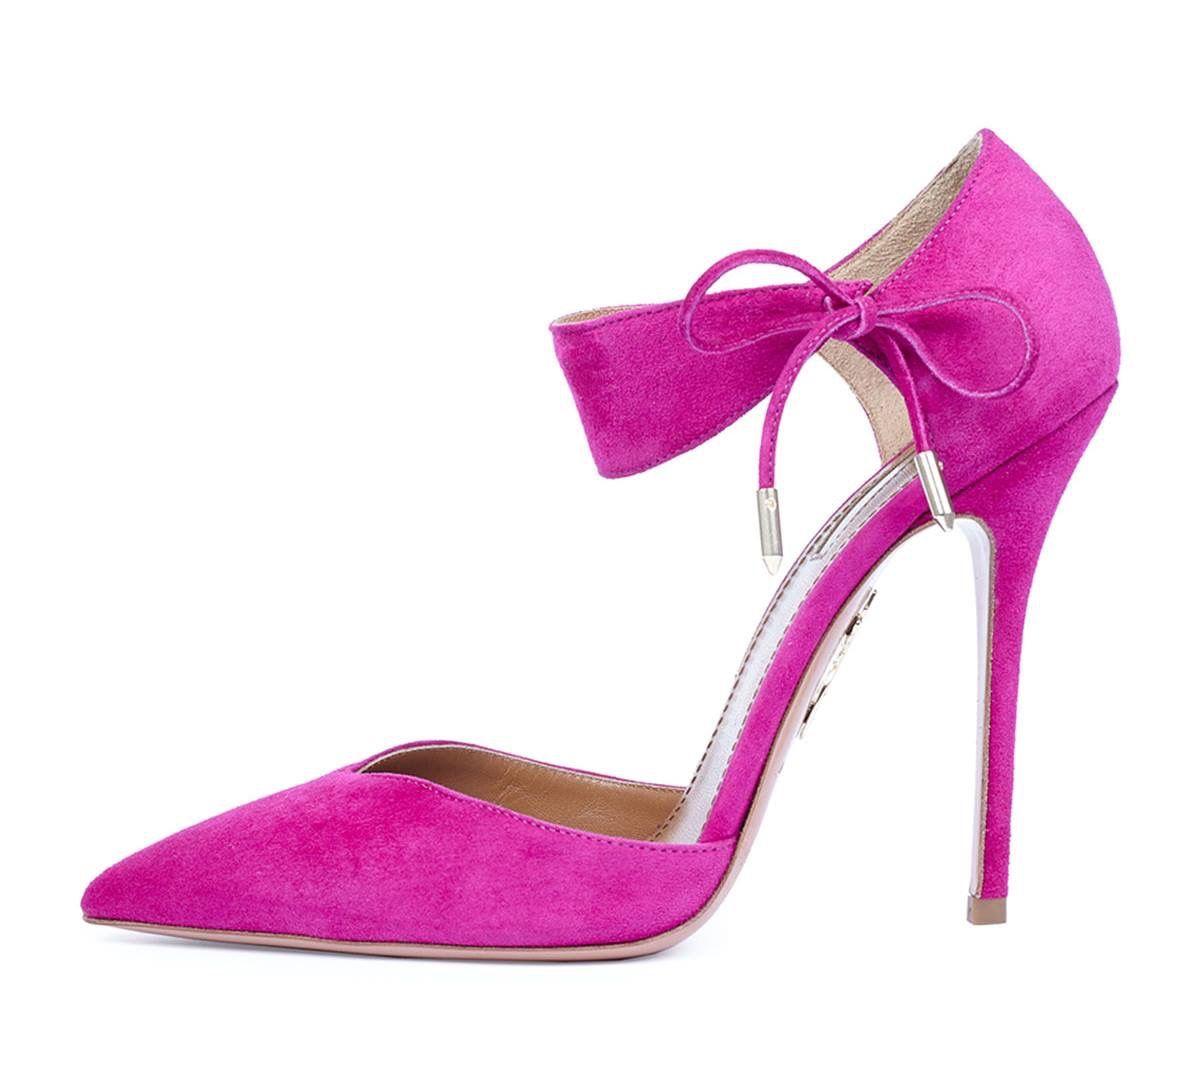 27e712e2195 Pin by Shurna van der Heijden- Windster on lovely heels ...